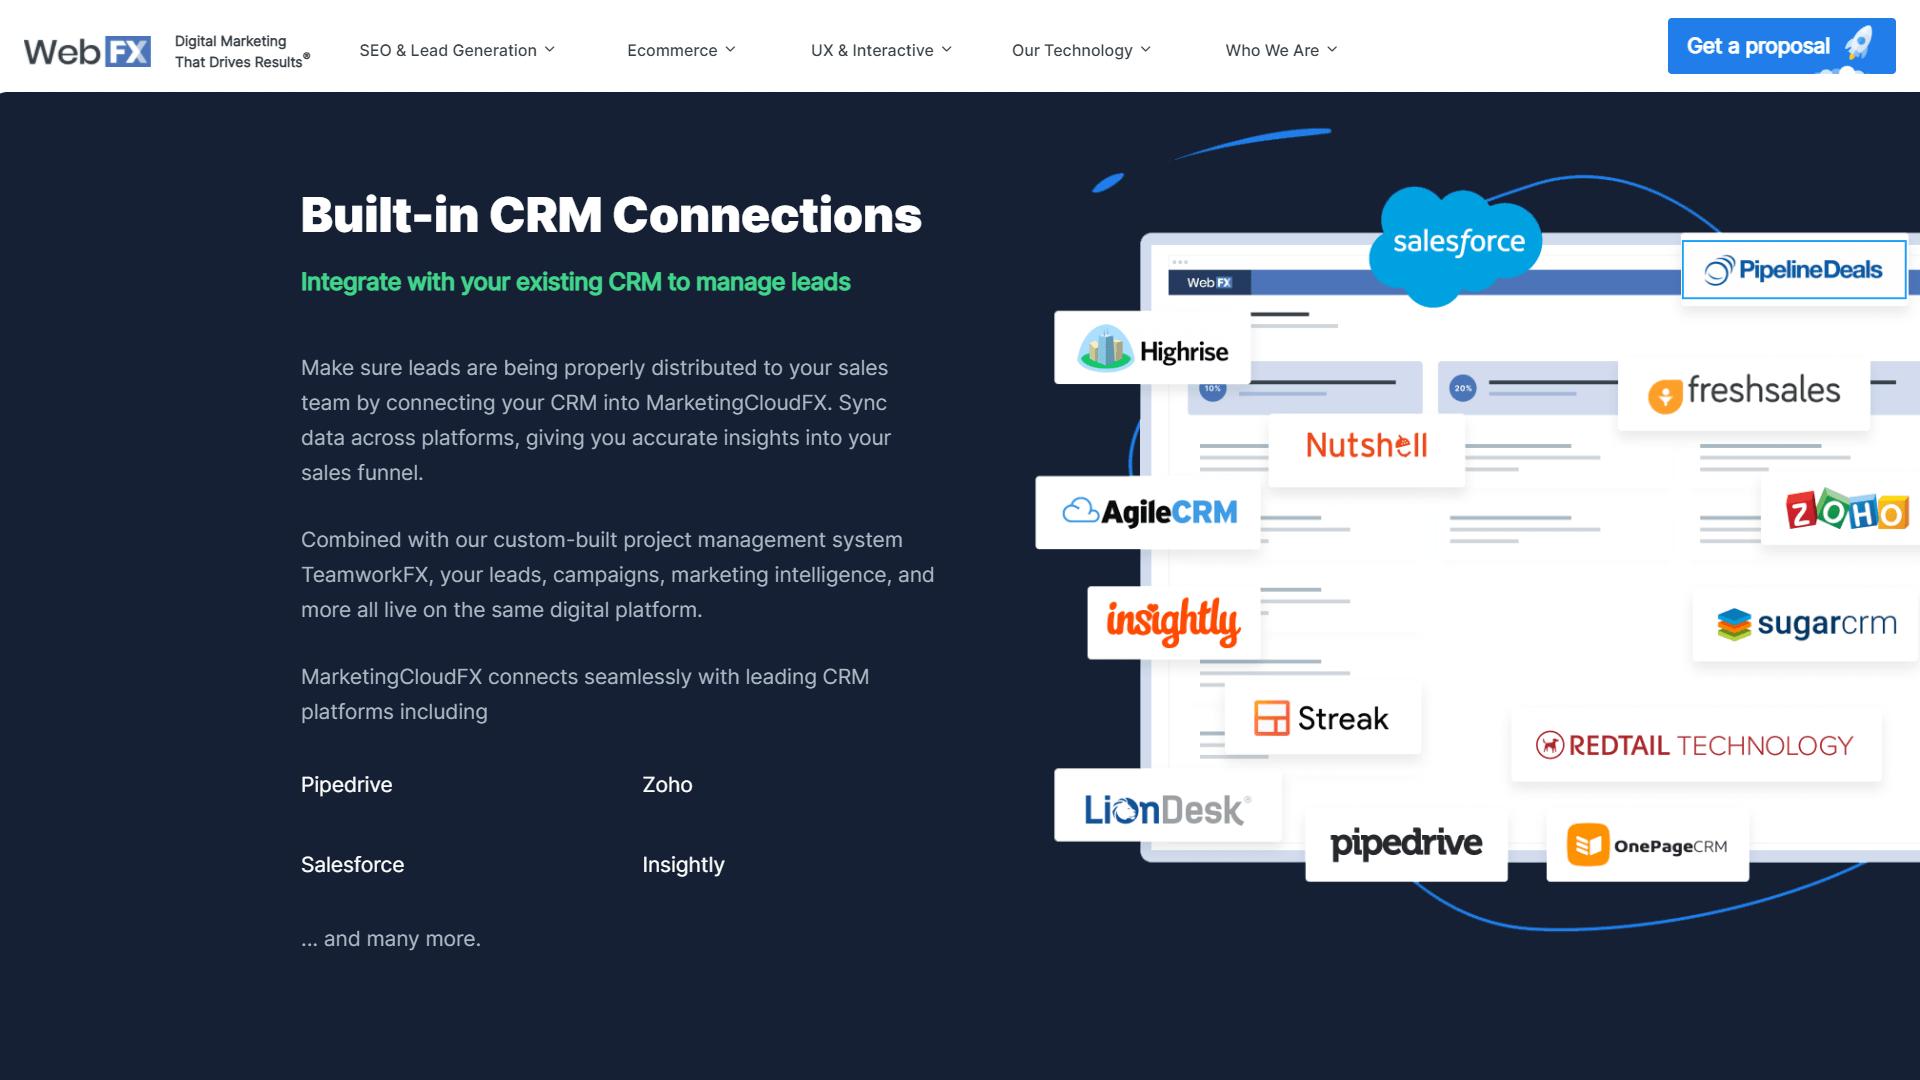 MarketingCloudFX – Marketing automation software by WebFX4